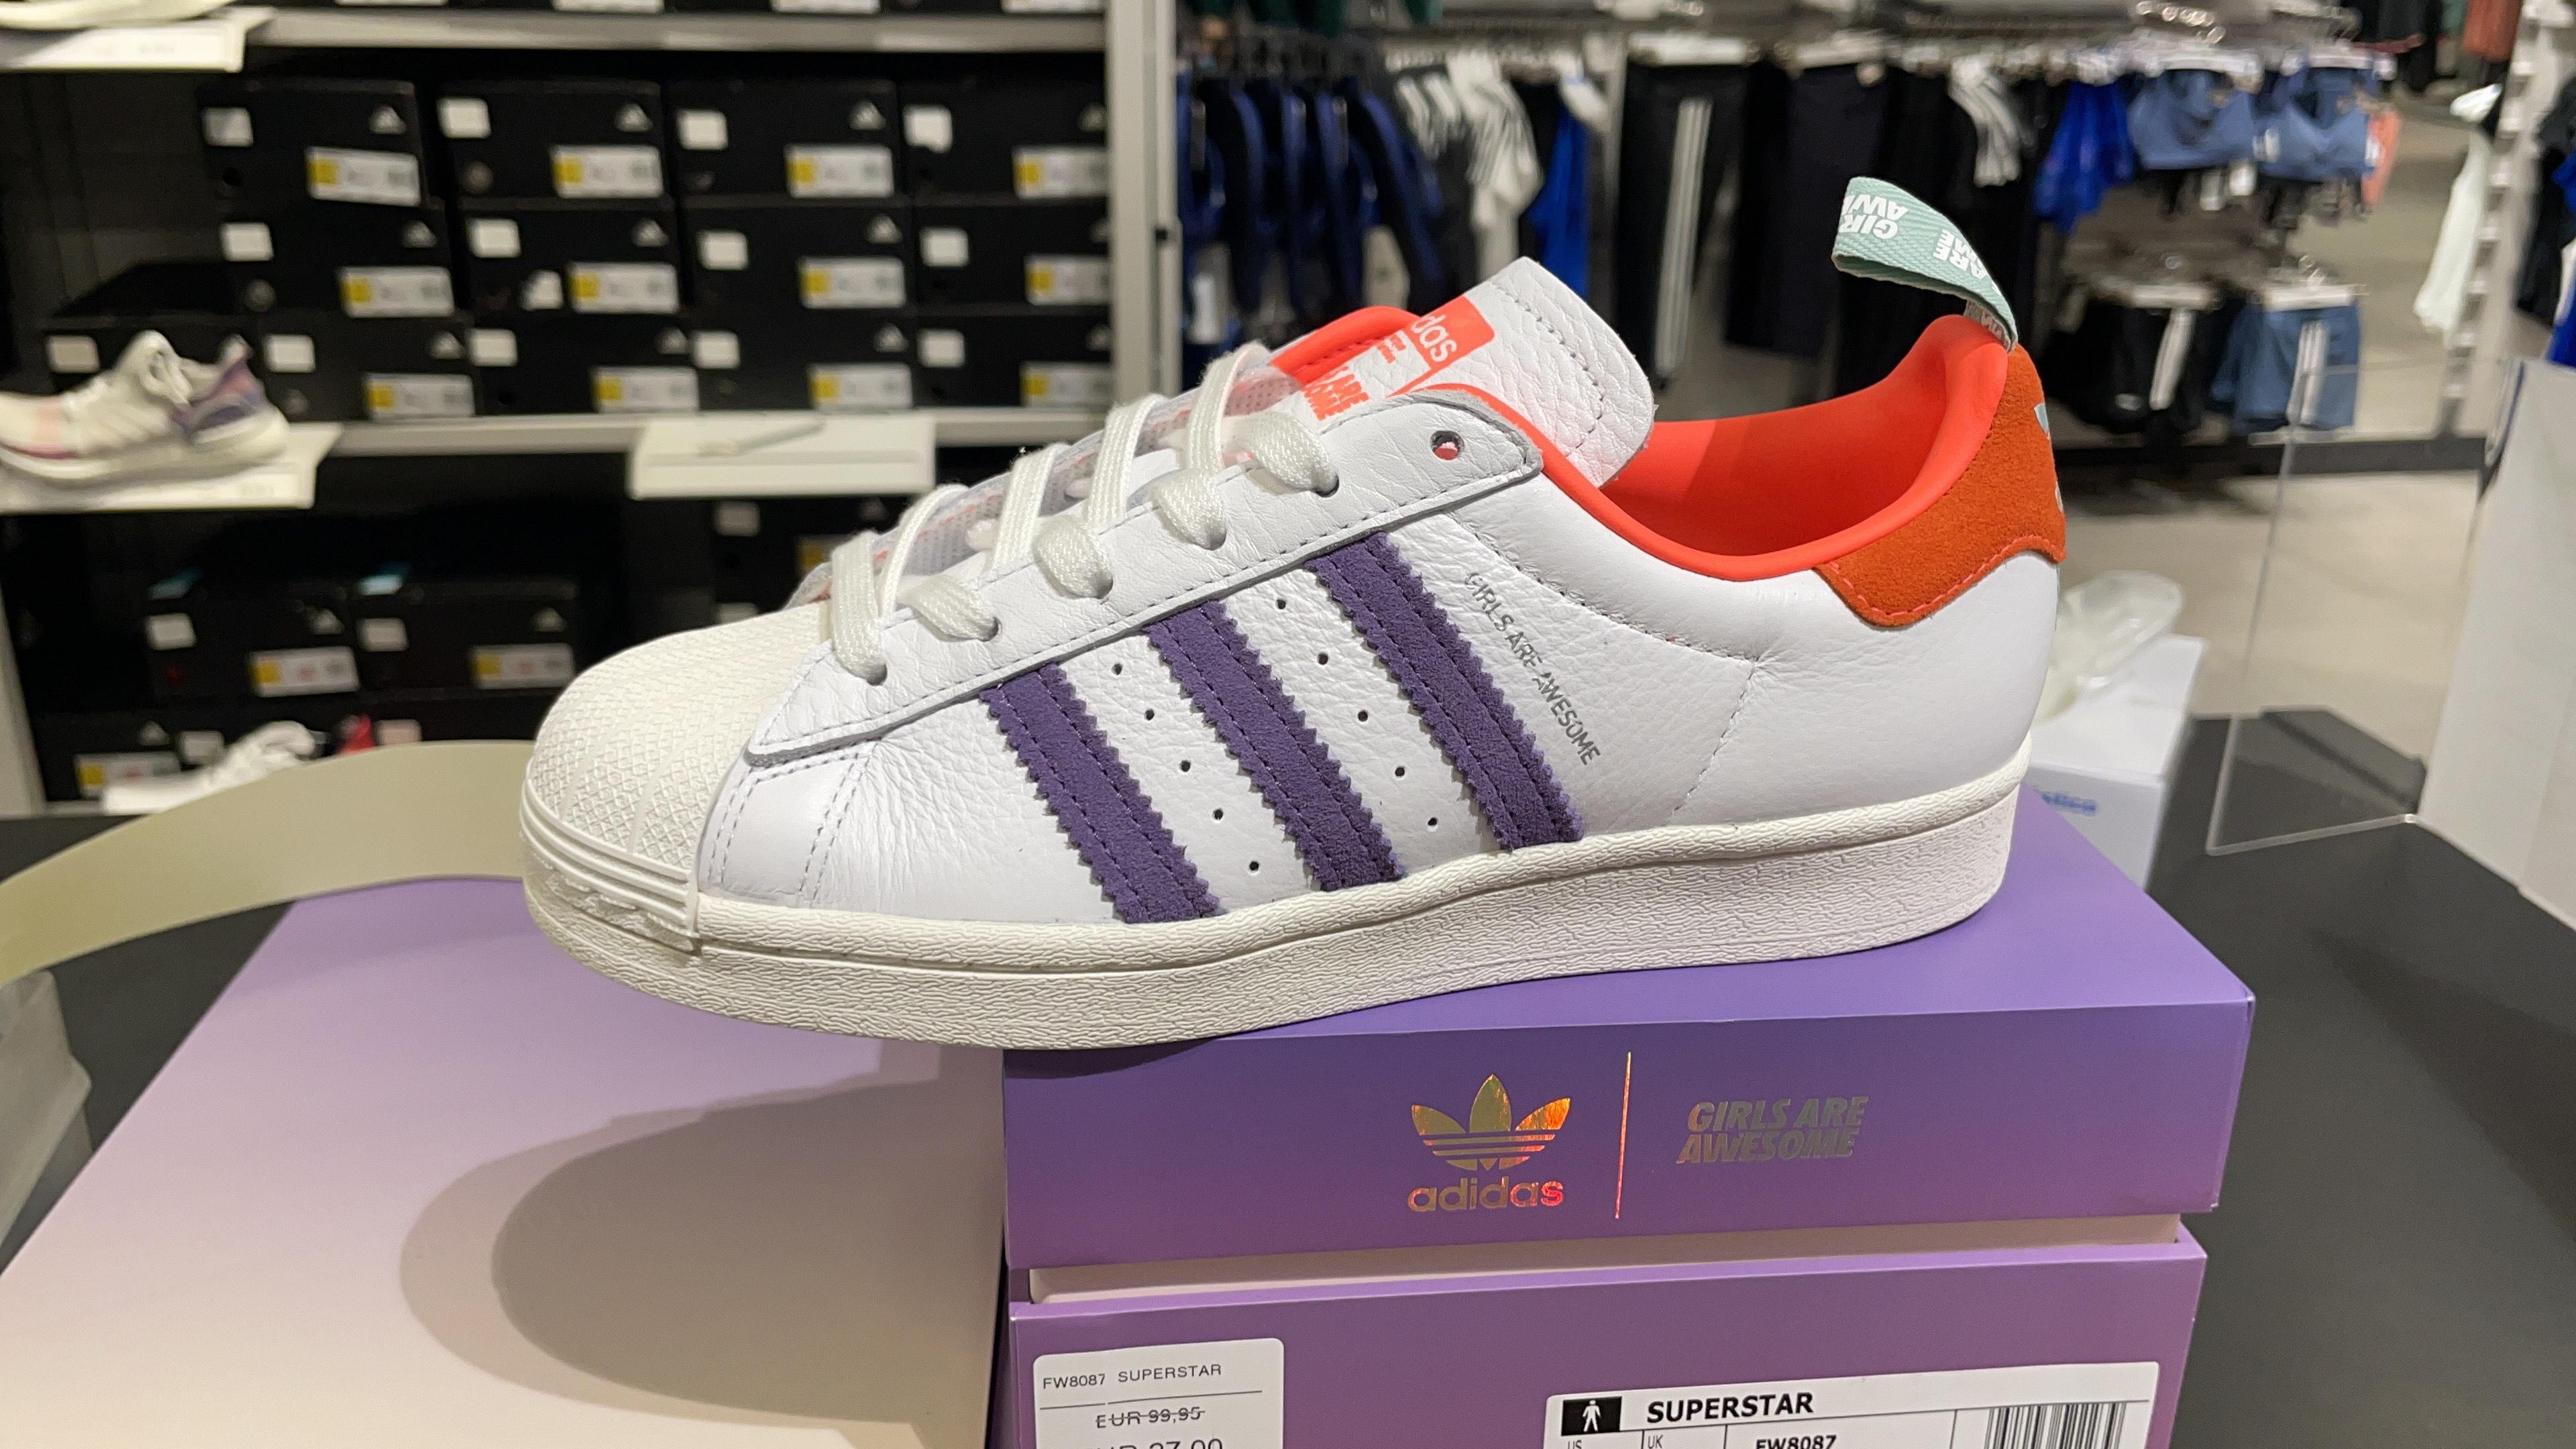 Adidas SUPERSTAR edicion Limitada